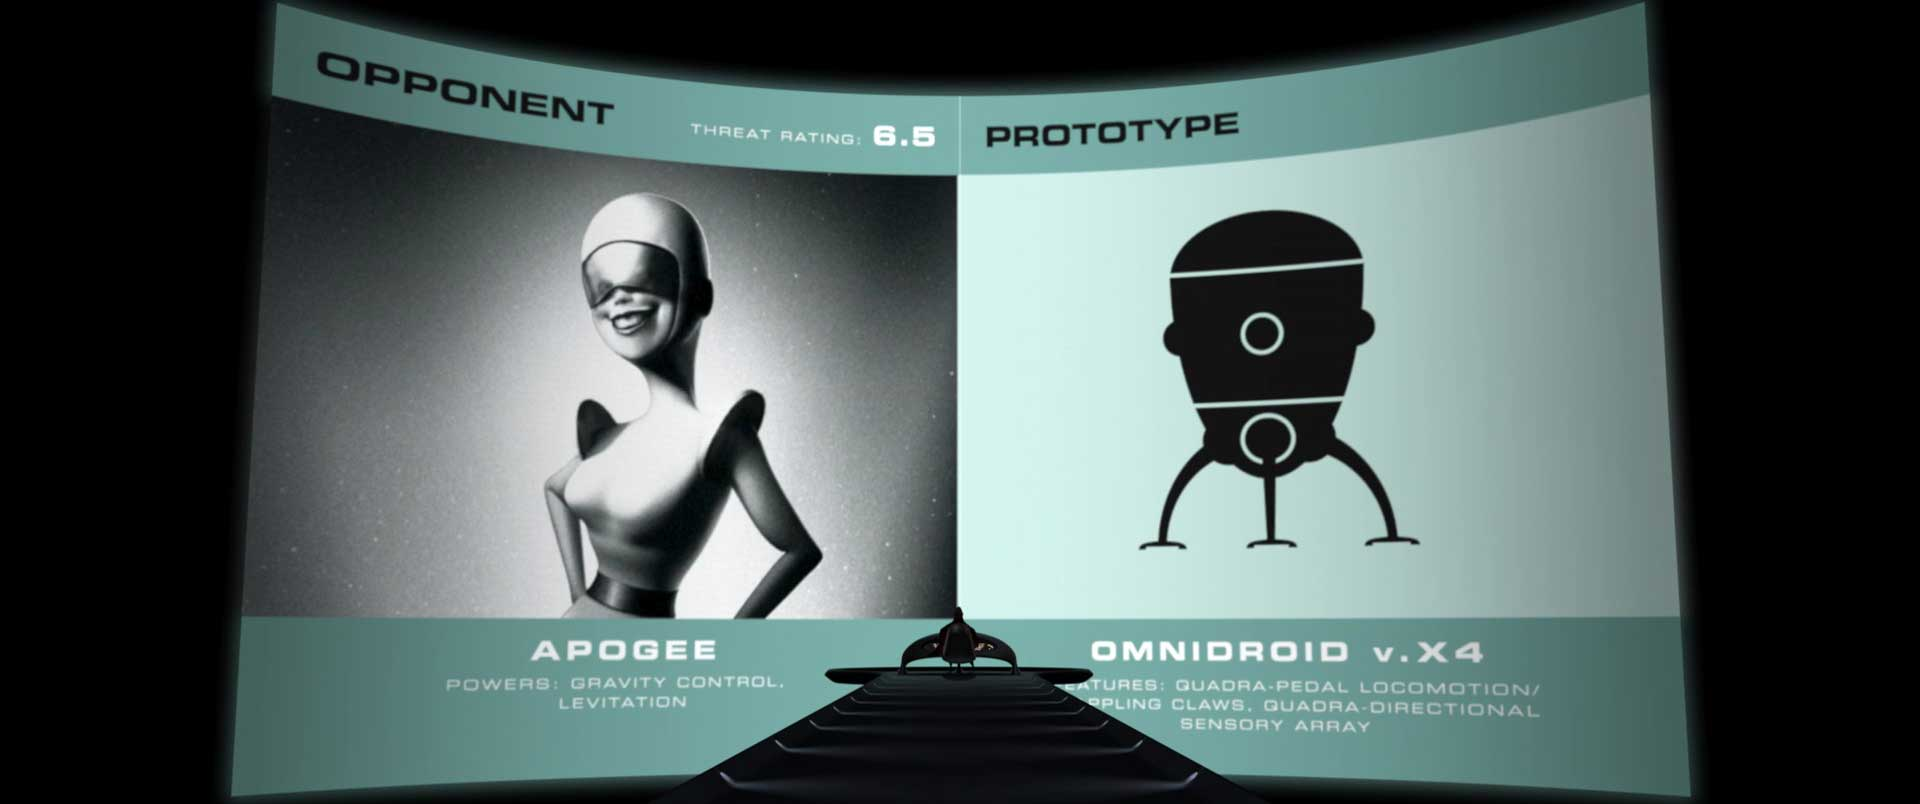 apogee pixar disney personnage character indestructibles incredibles